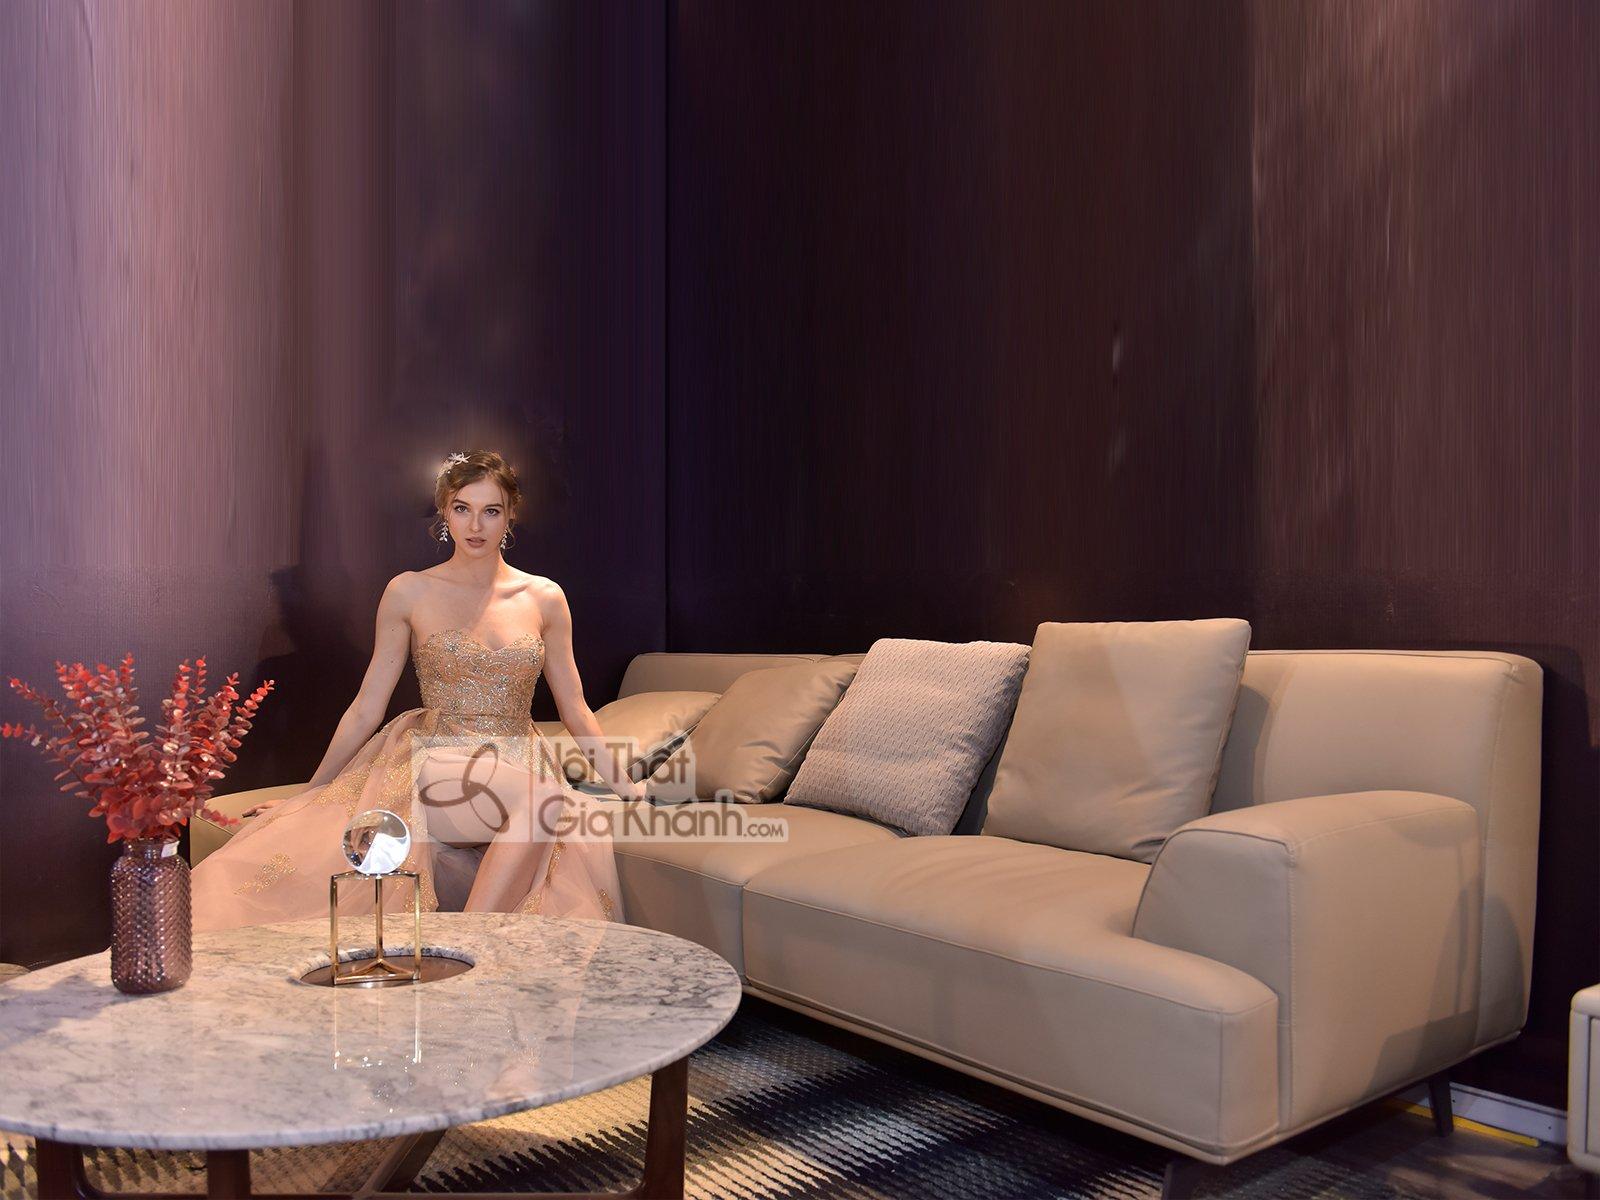 sofa da 2 bang goc phai phong cach hien dai mbk8037gp - Sofa góc phải phong cách hiện đại SP8037T50-2